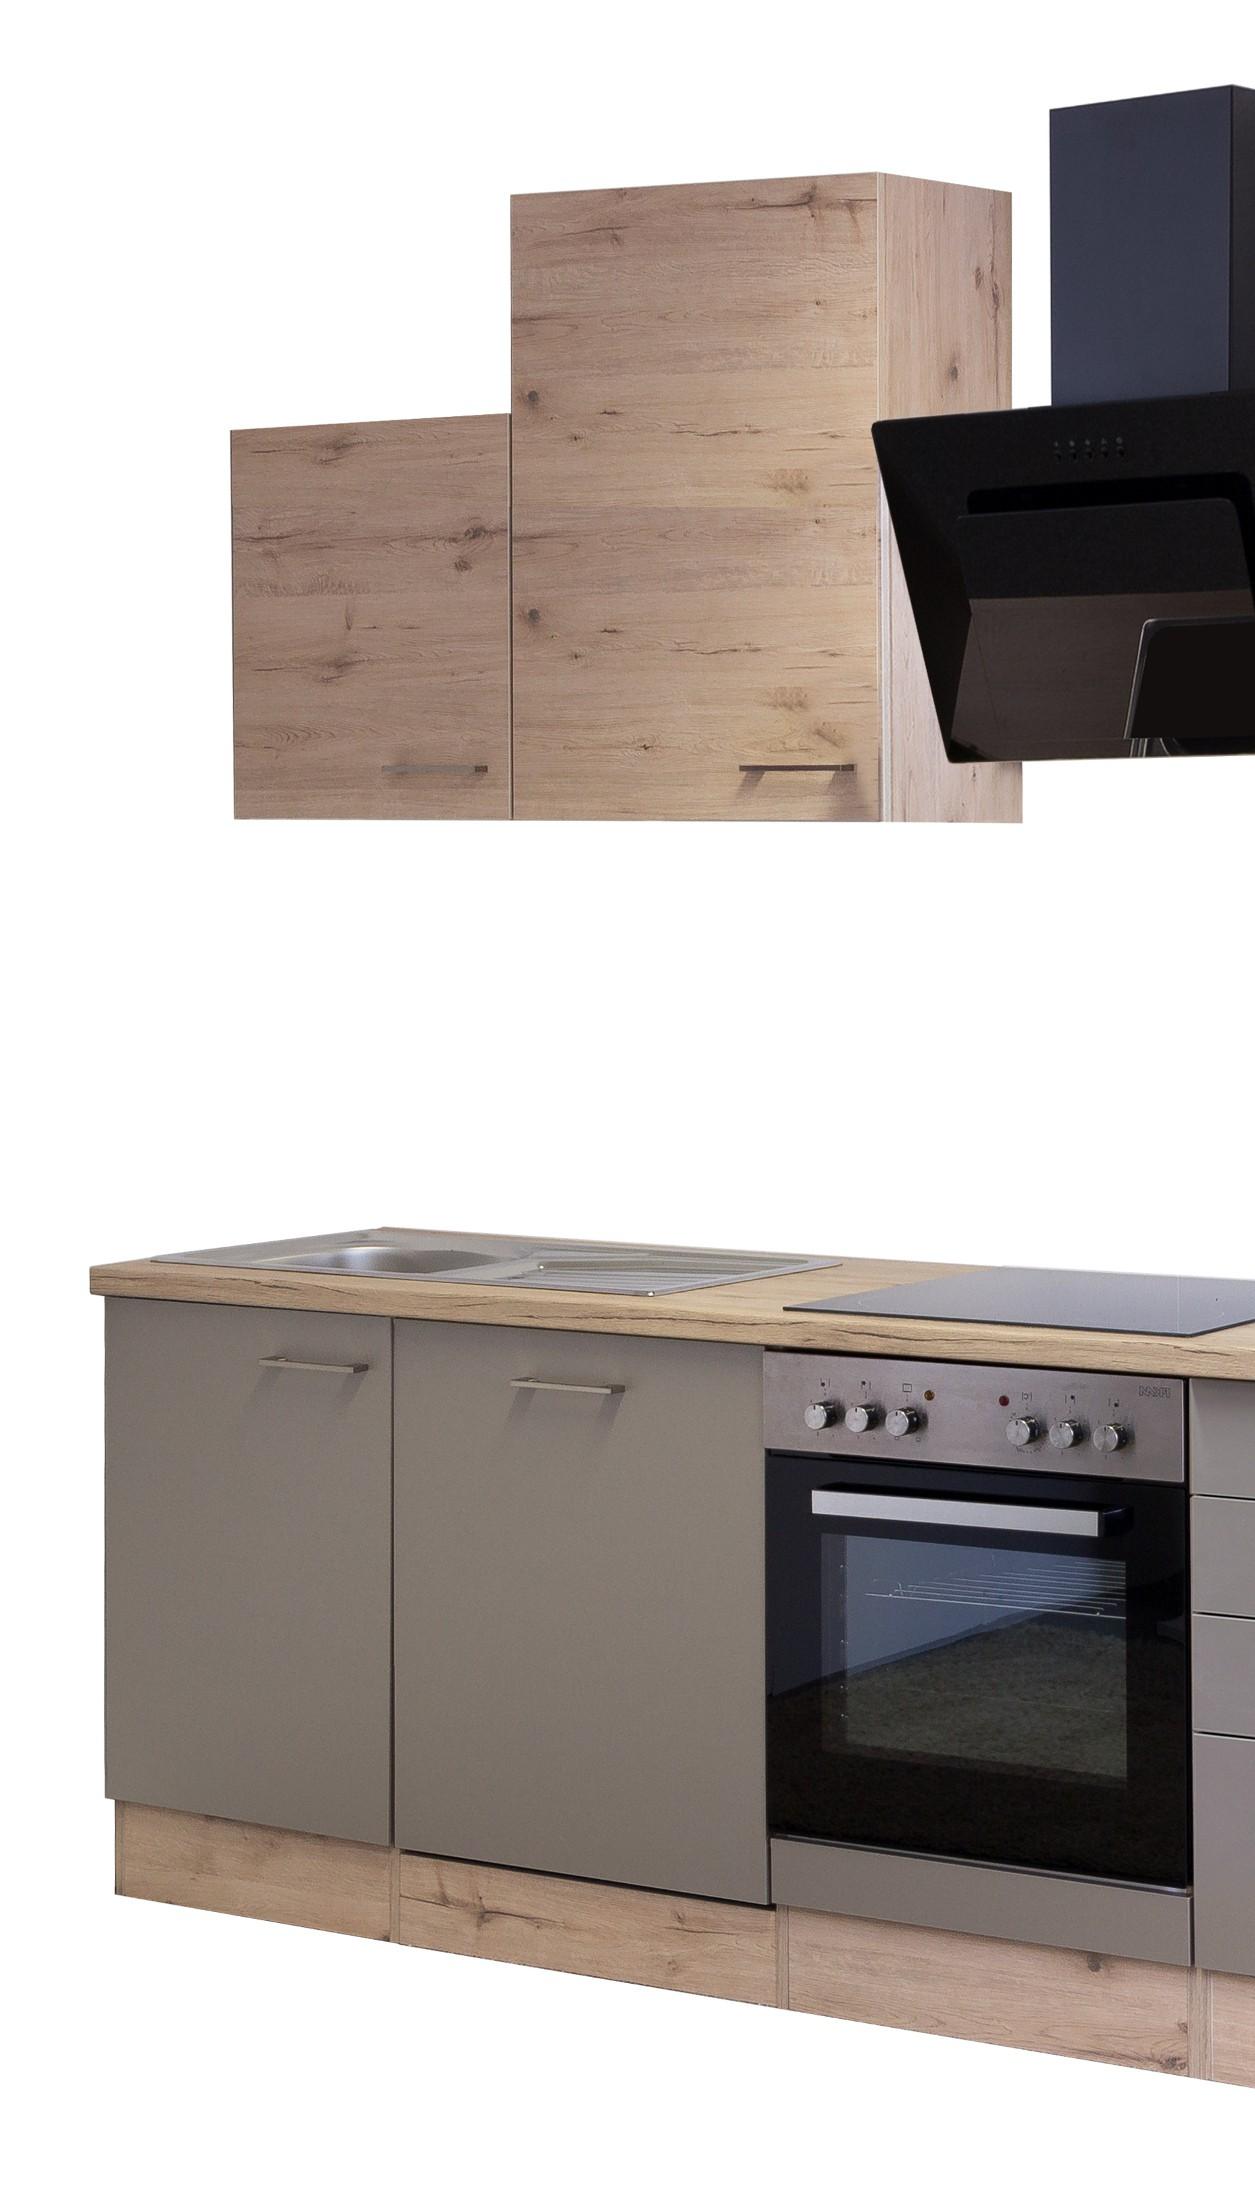 k chenzeile riva k che mit e ger ten und design. Black Bedroom Furniture Sets. Home Design Ideas